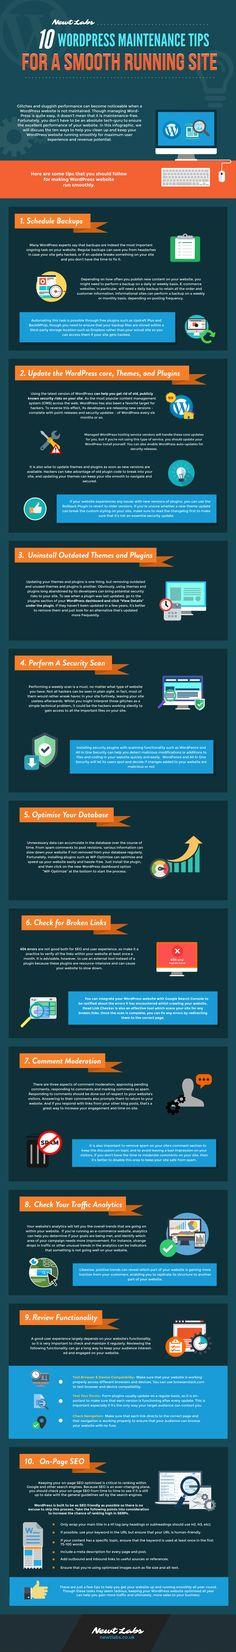 10 WordPress Maintenance Tips For A Smooth Running Site #Infographic #WebDesign #WordPress